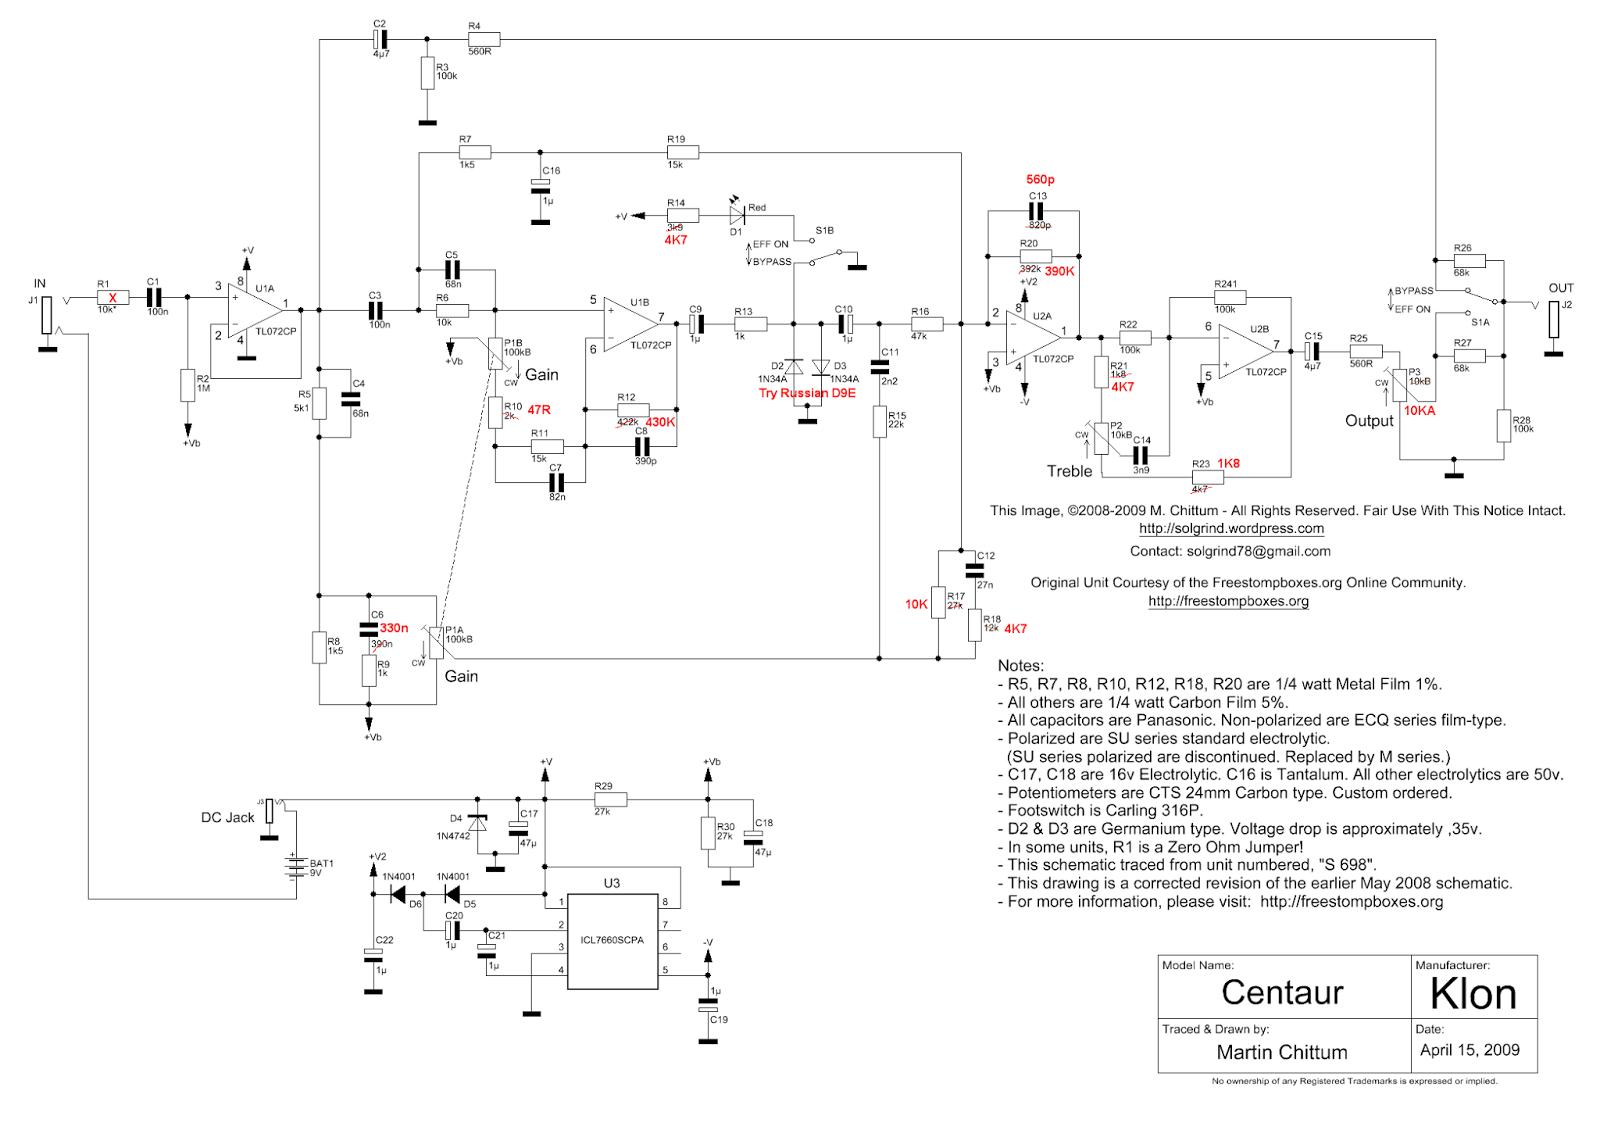 carvin humbucker wiring diagram carvin humbucker 3 wire wiring diagram carvin wiring diagram carvin pickup wiring [ 1600 x 1130 Pixel ]